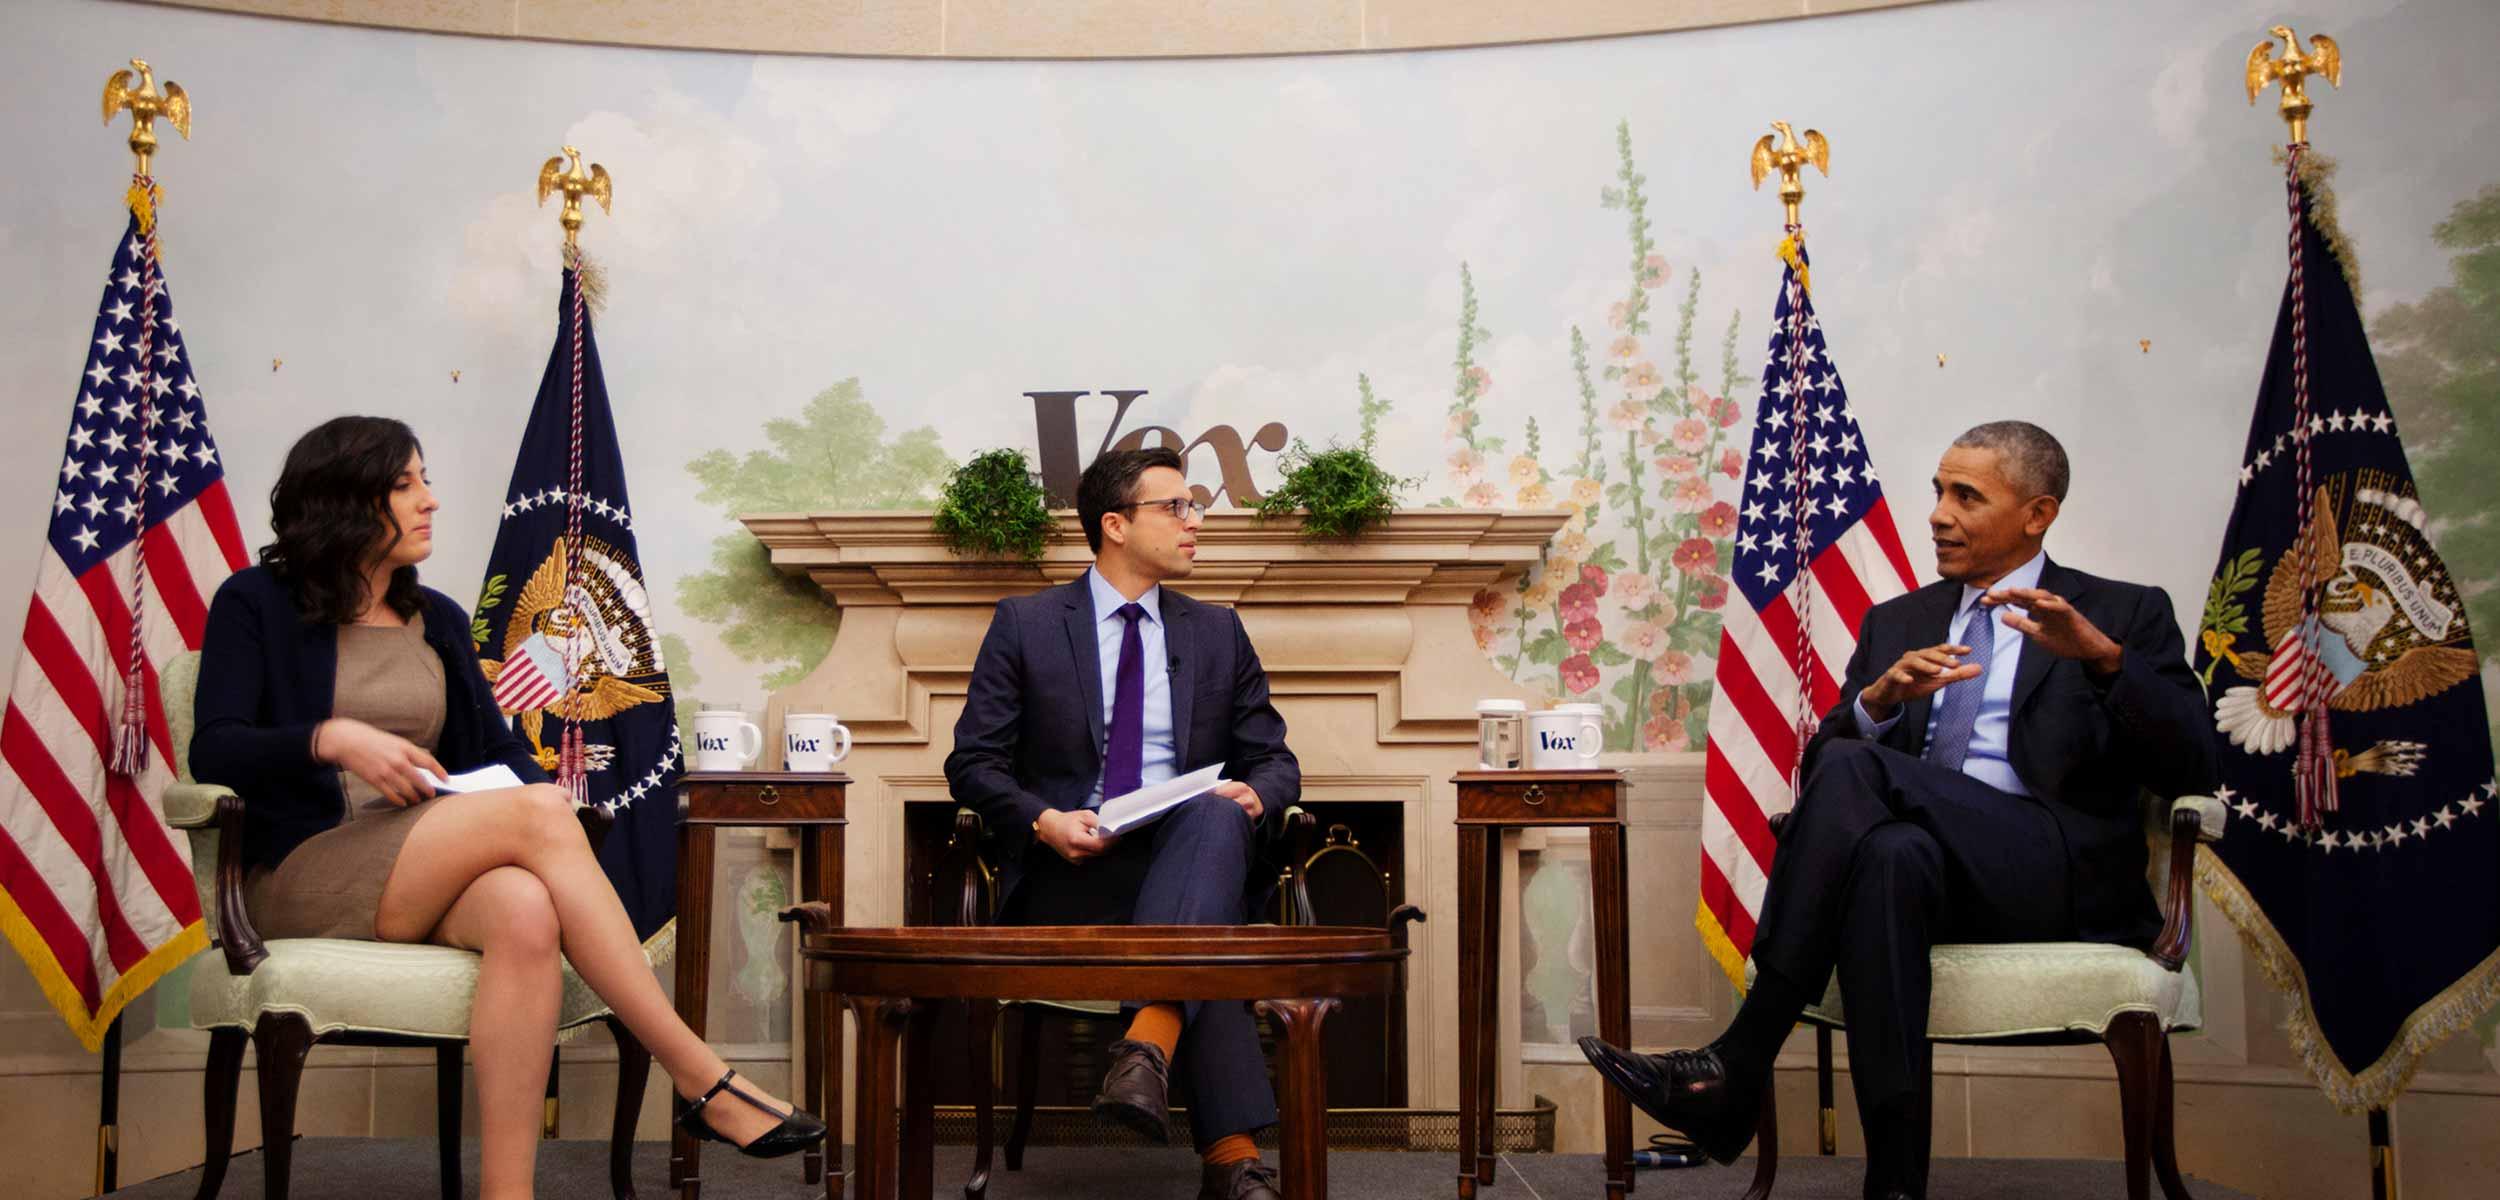 President Barack Obama with Vox's Sarah Kliff and Ezra Klein at White House 2017.